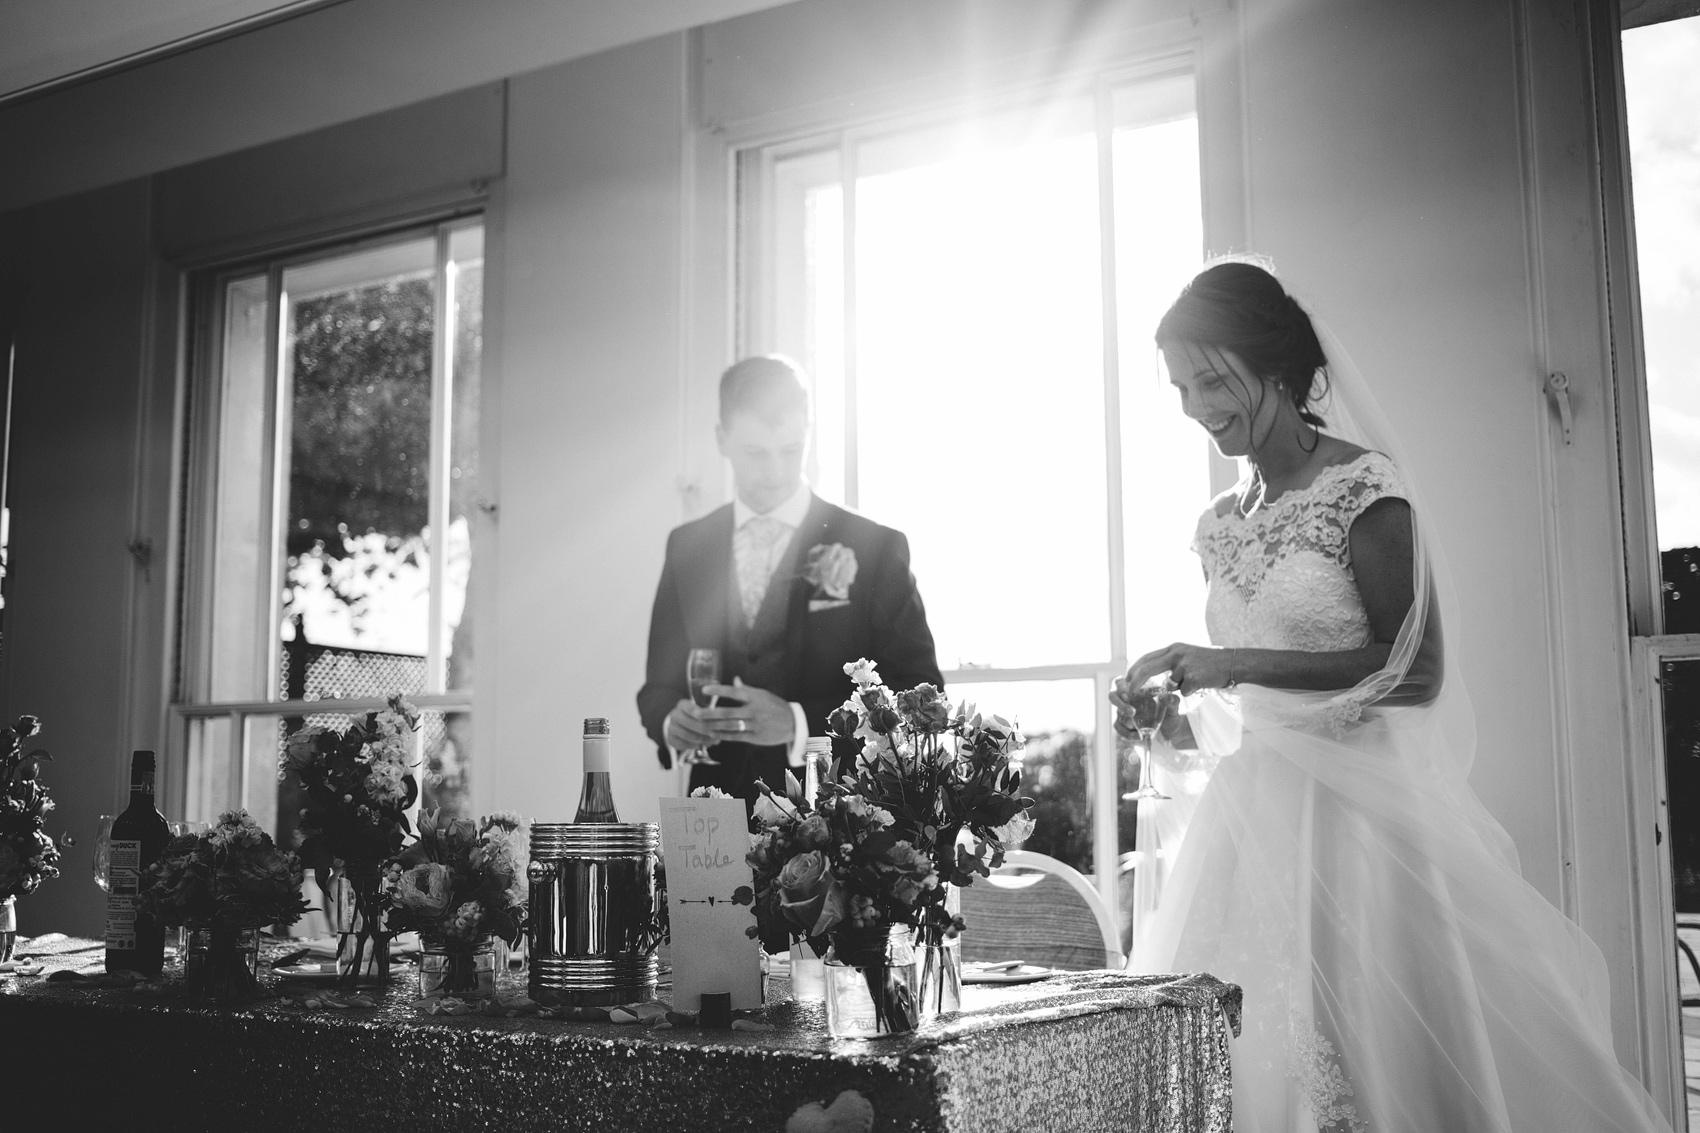 Claire_Basiuk_Richmond_Park,_London_Wedding_Photography_-20.jpg